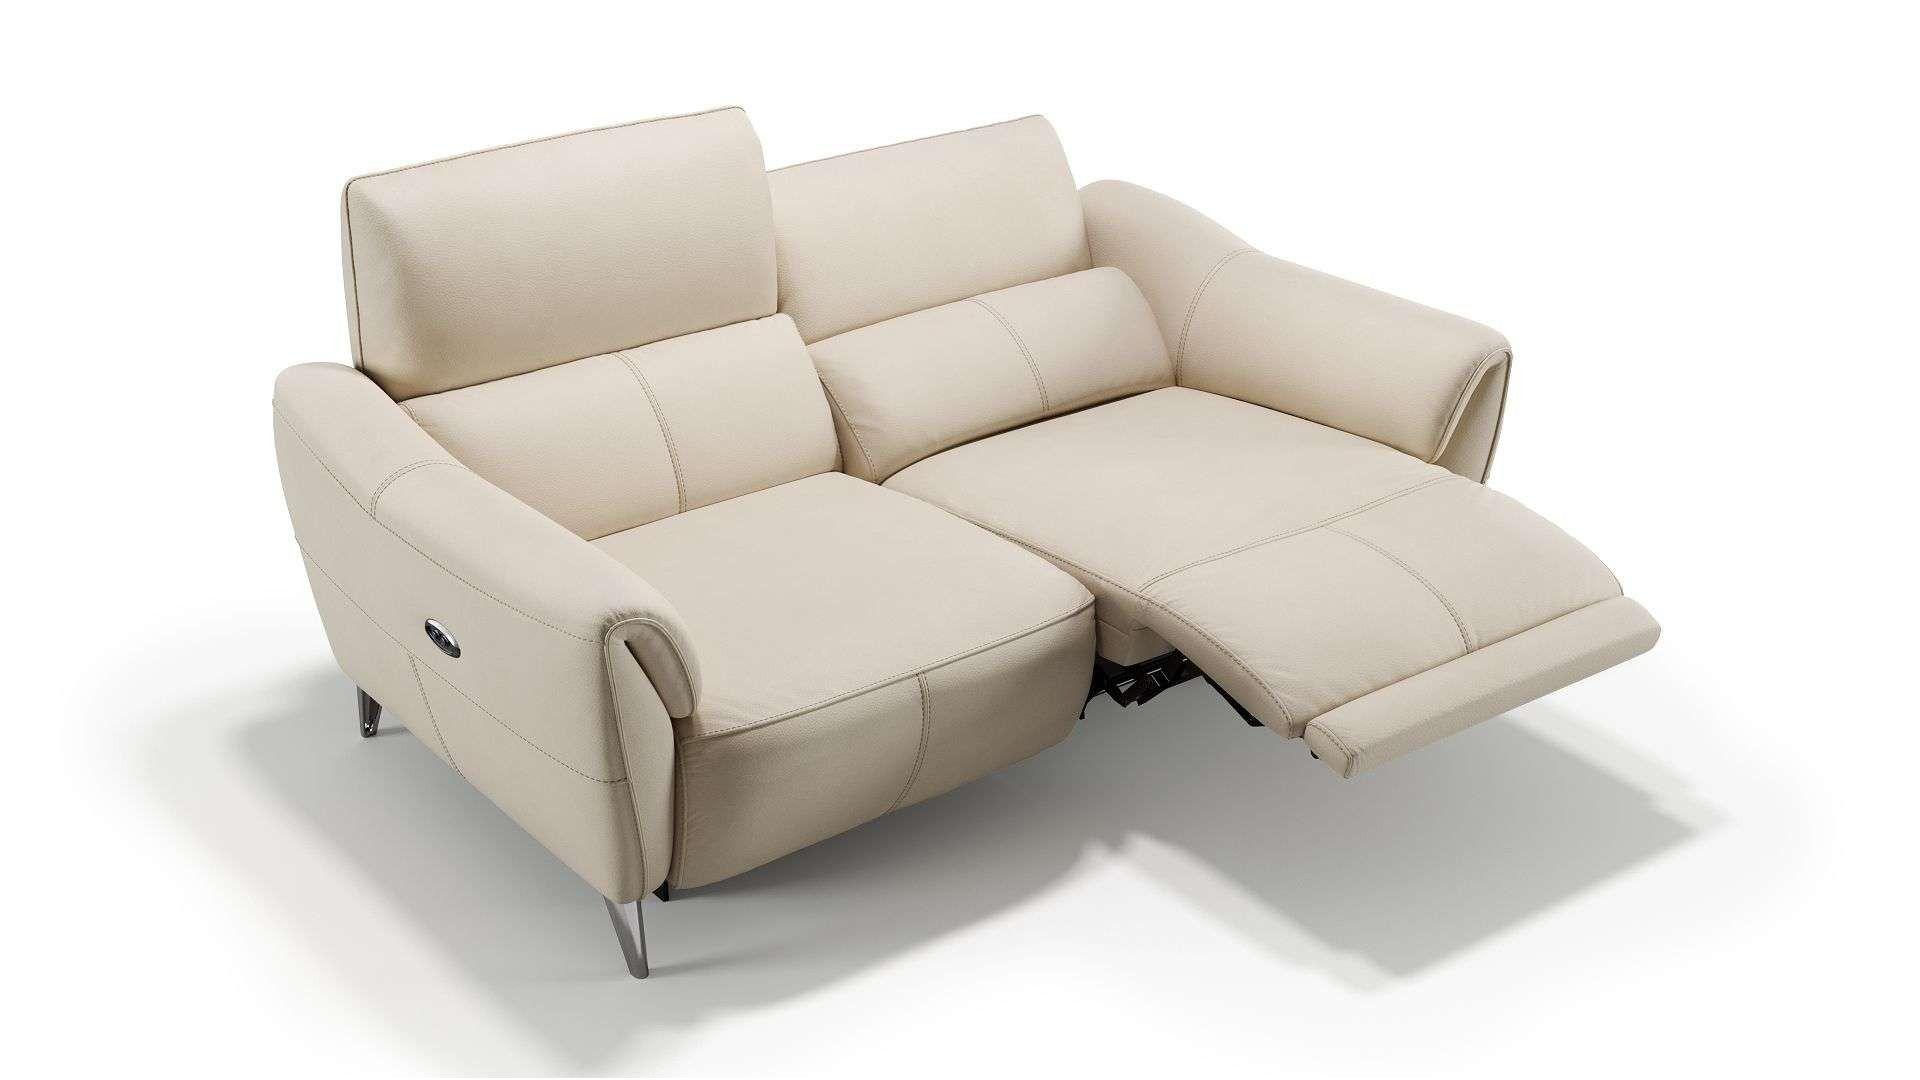 Marvelous 2 Sitzer Sofa Grau